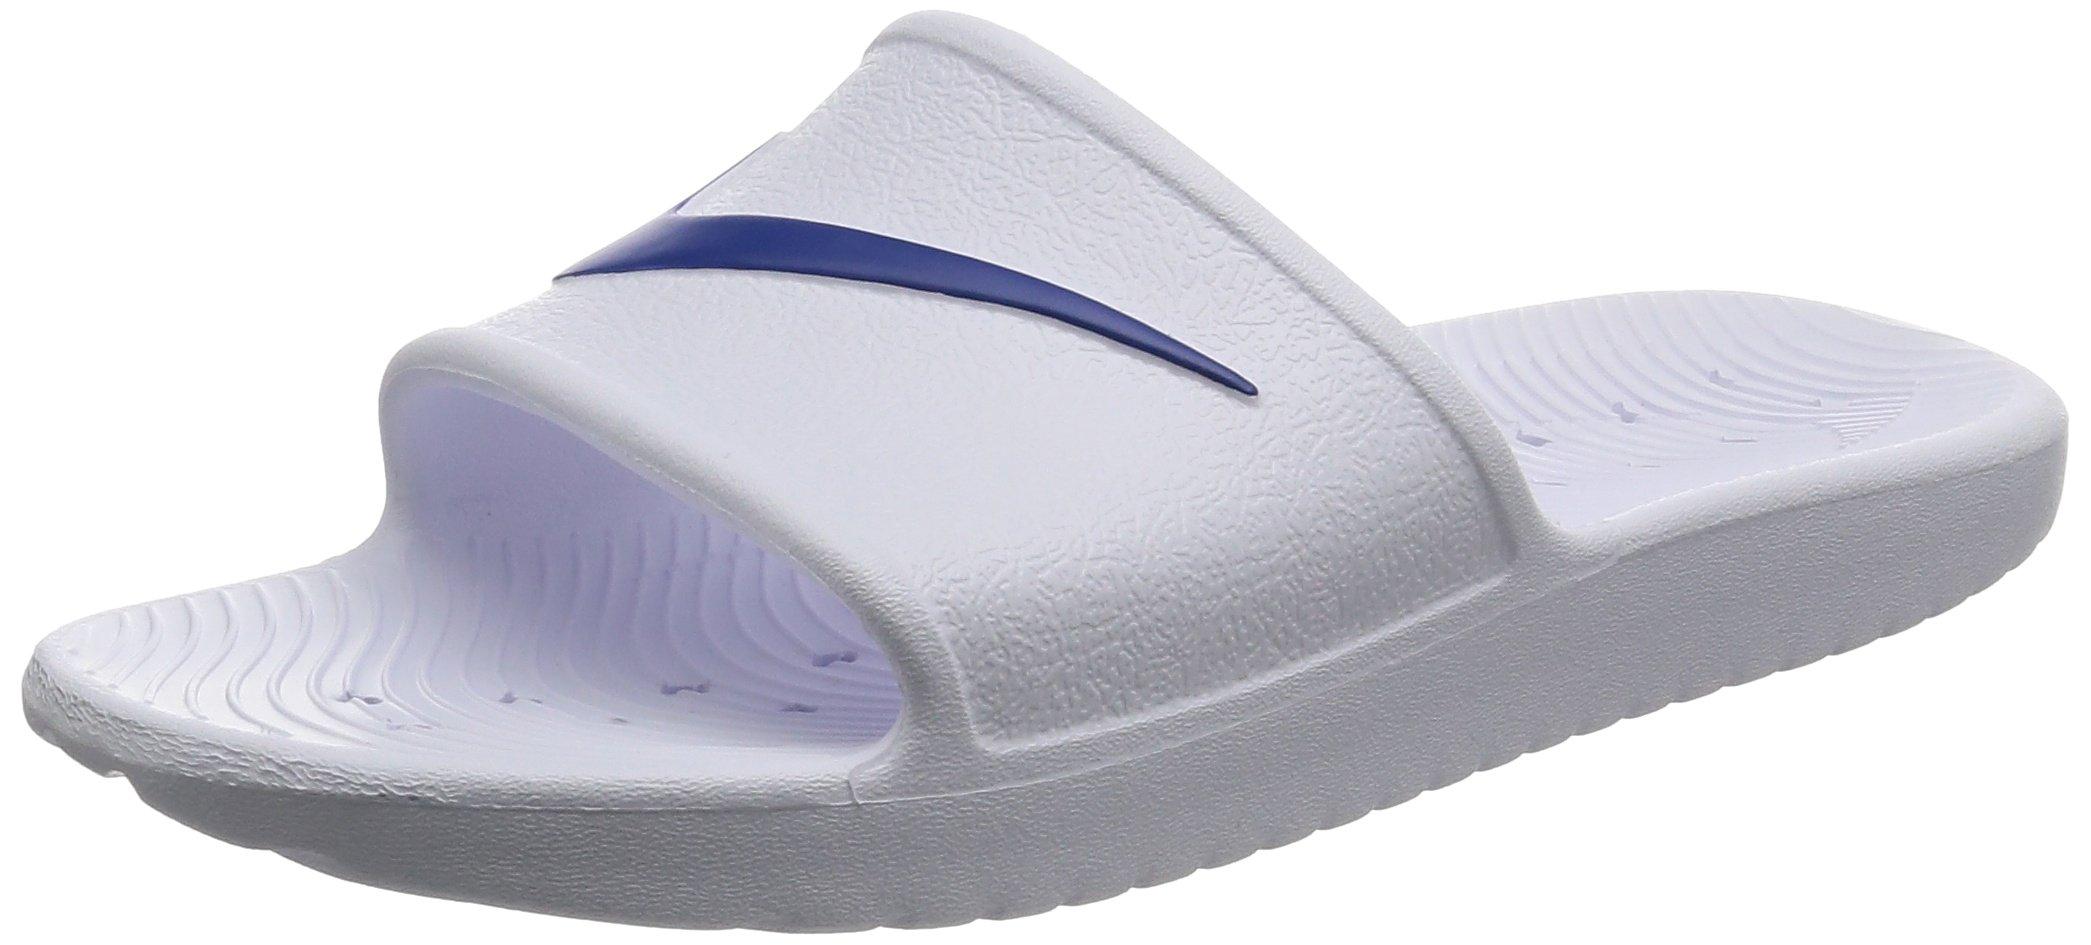 Nike Men's Kawa Shower Slides (10, White/Blue Moon)